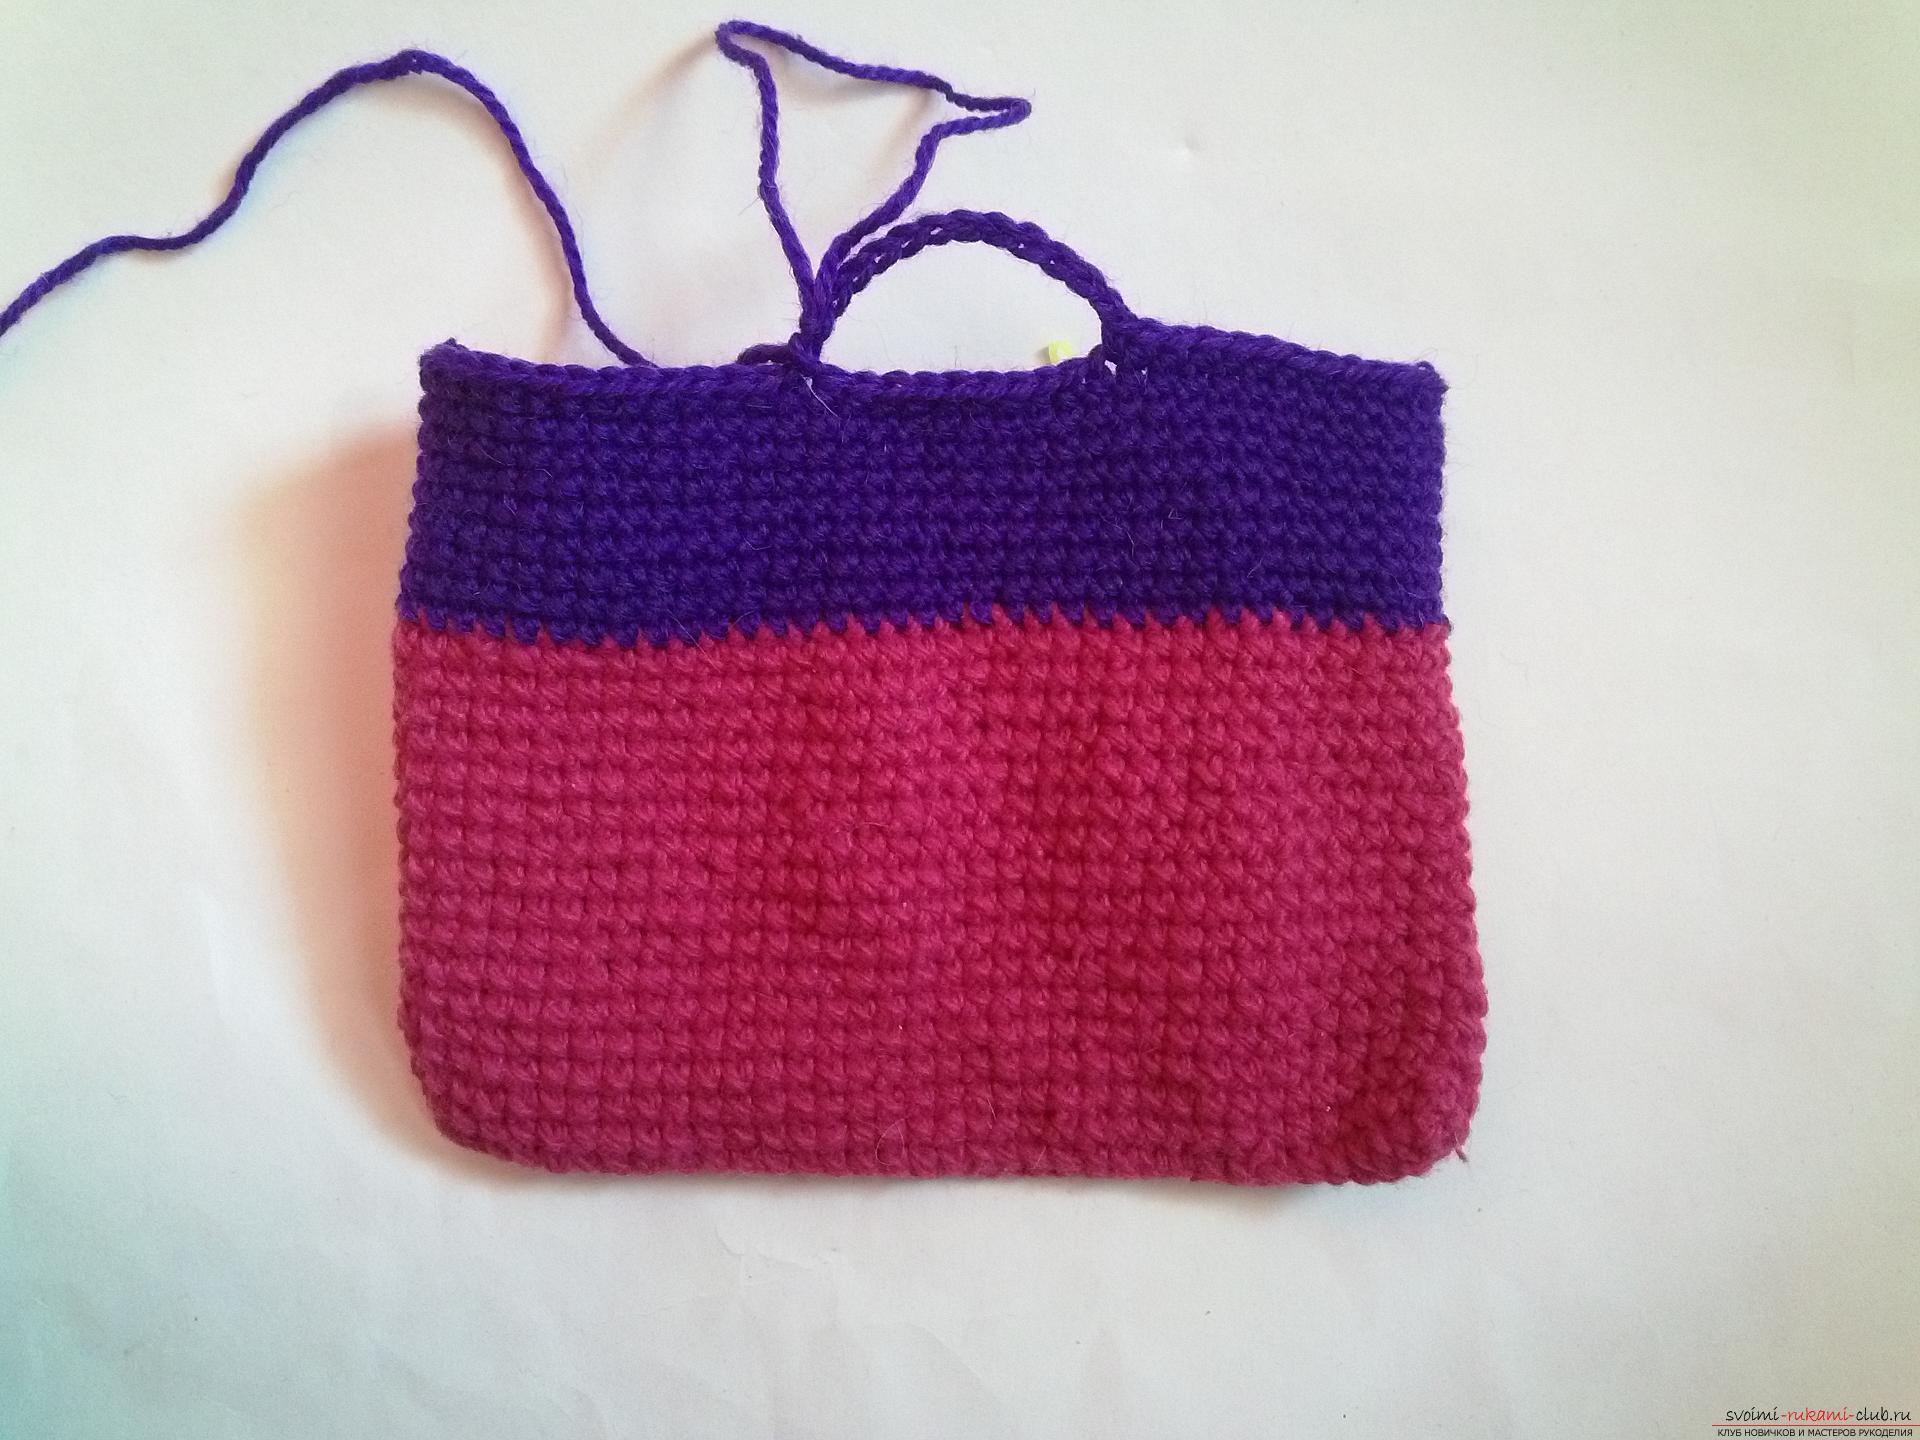 Вязание сумок крючком видео-уроки 856